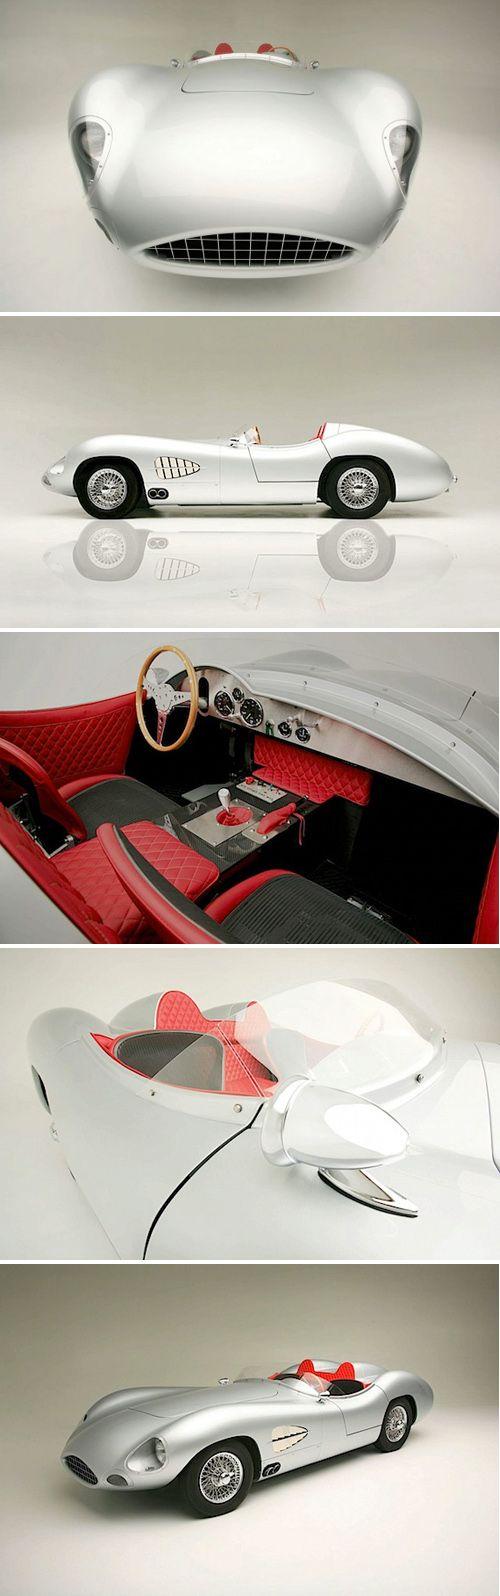 1957 Aston Martin DBR2 ~ Rizk Automobile rebuilt this 1957 Aston Martin with the challenge of using modern technology.